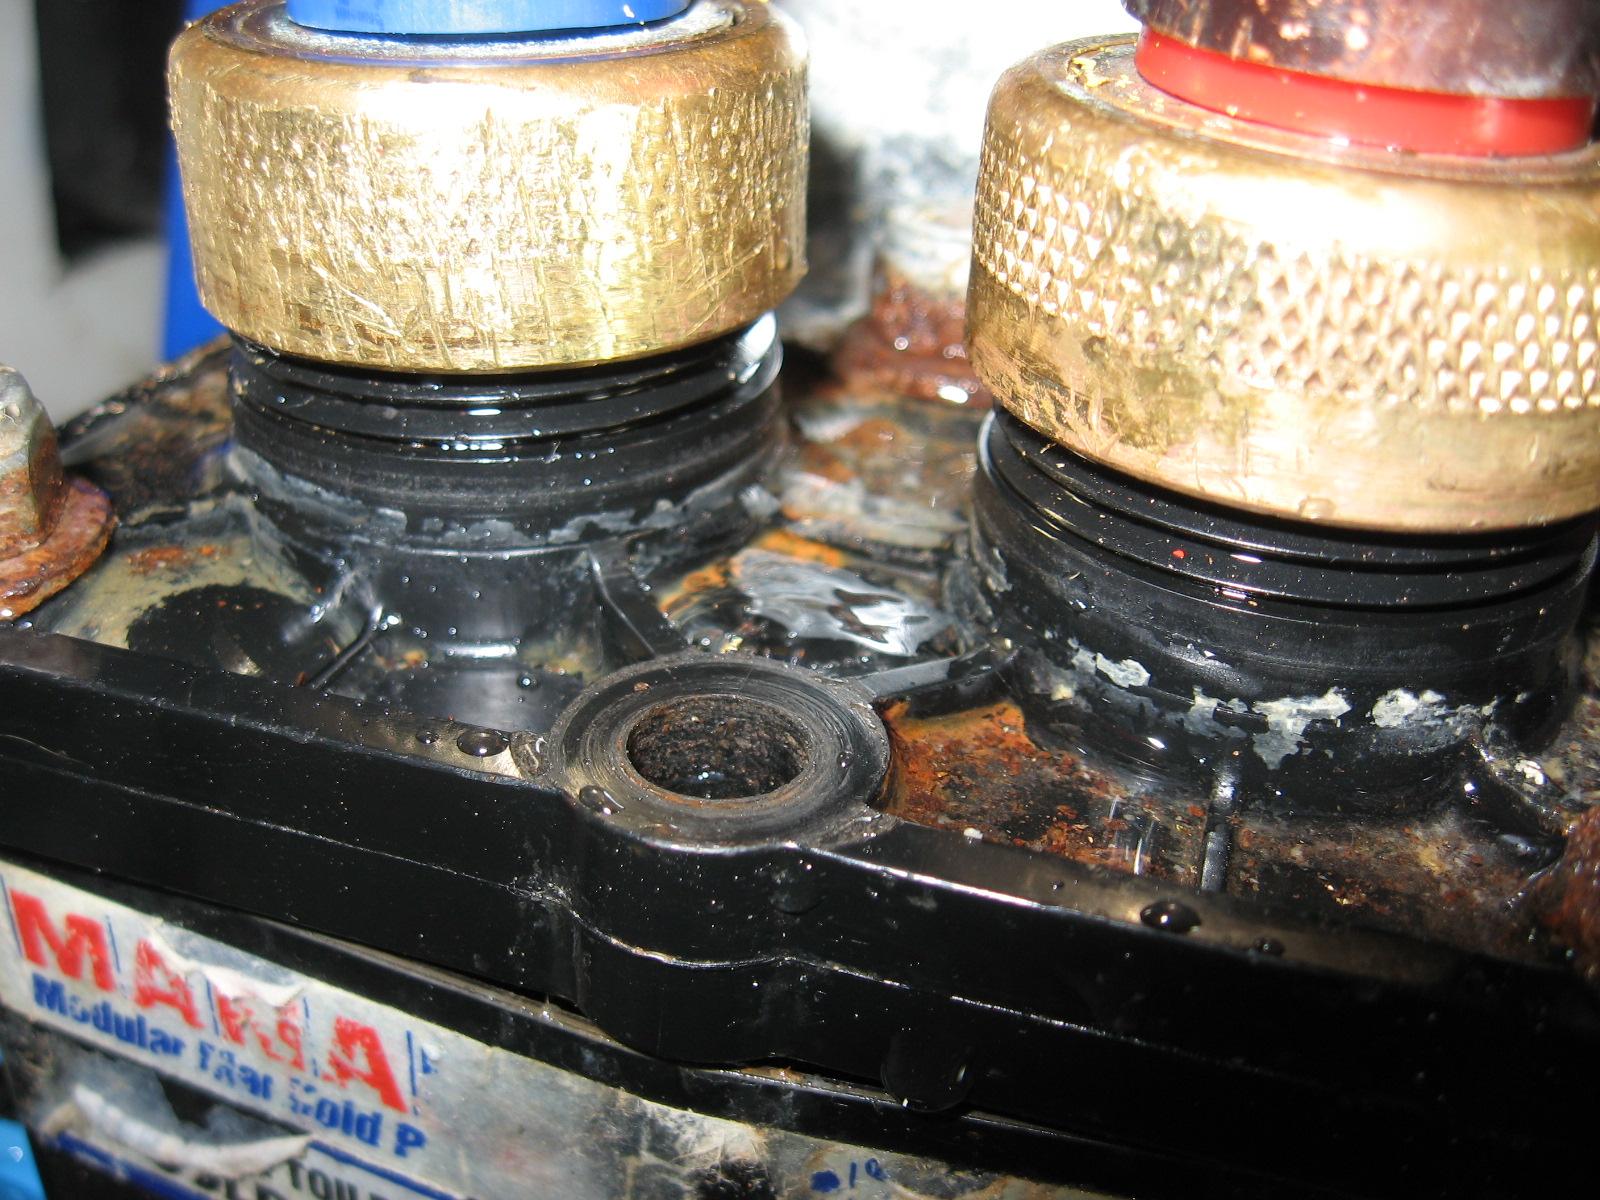 Years-Old Freeze Damage Atop Manabloc Manifold